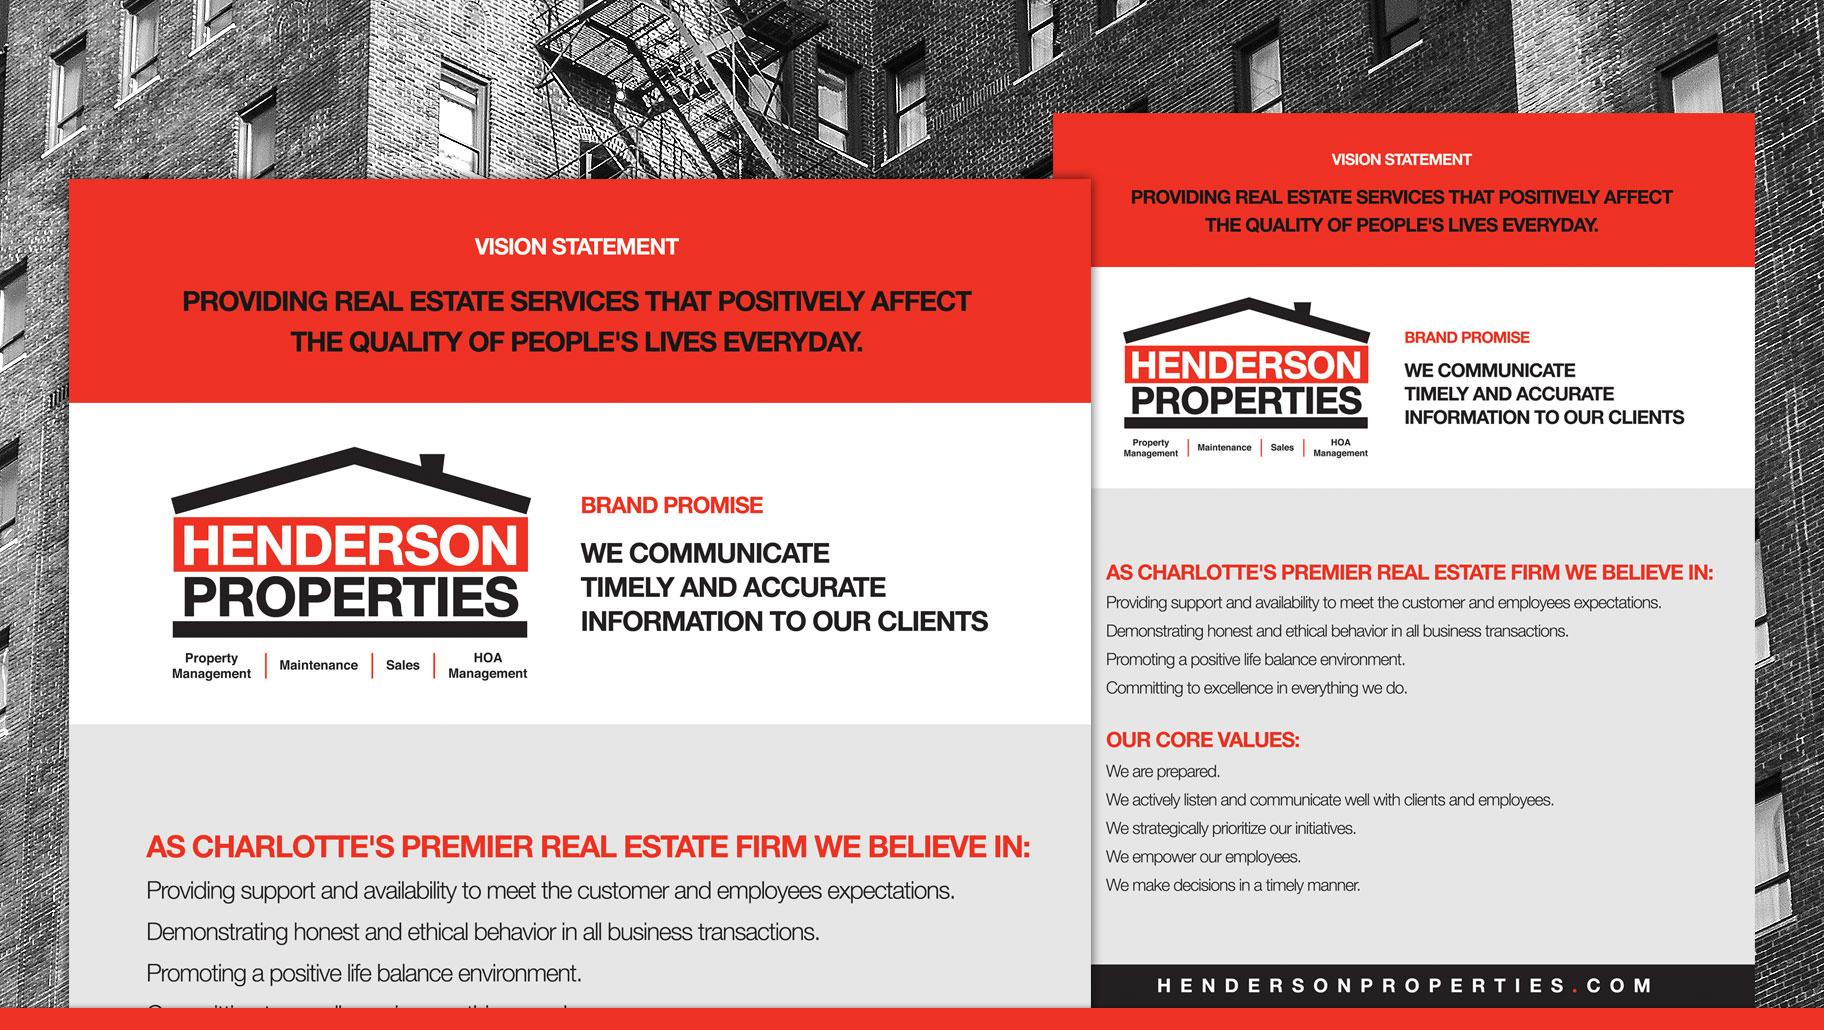 Henderson Properties